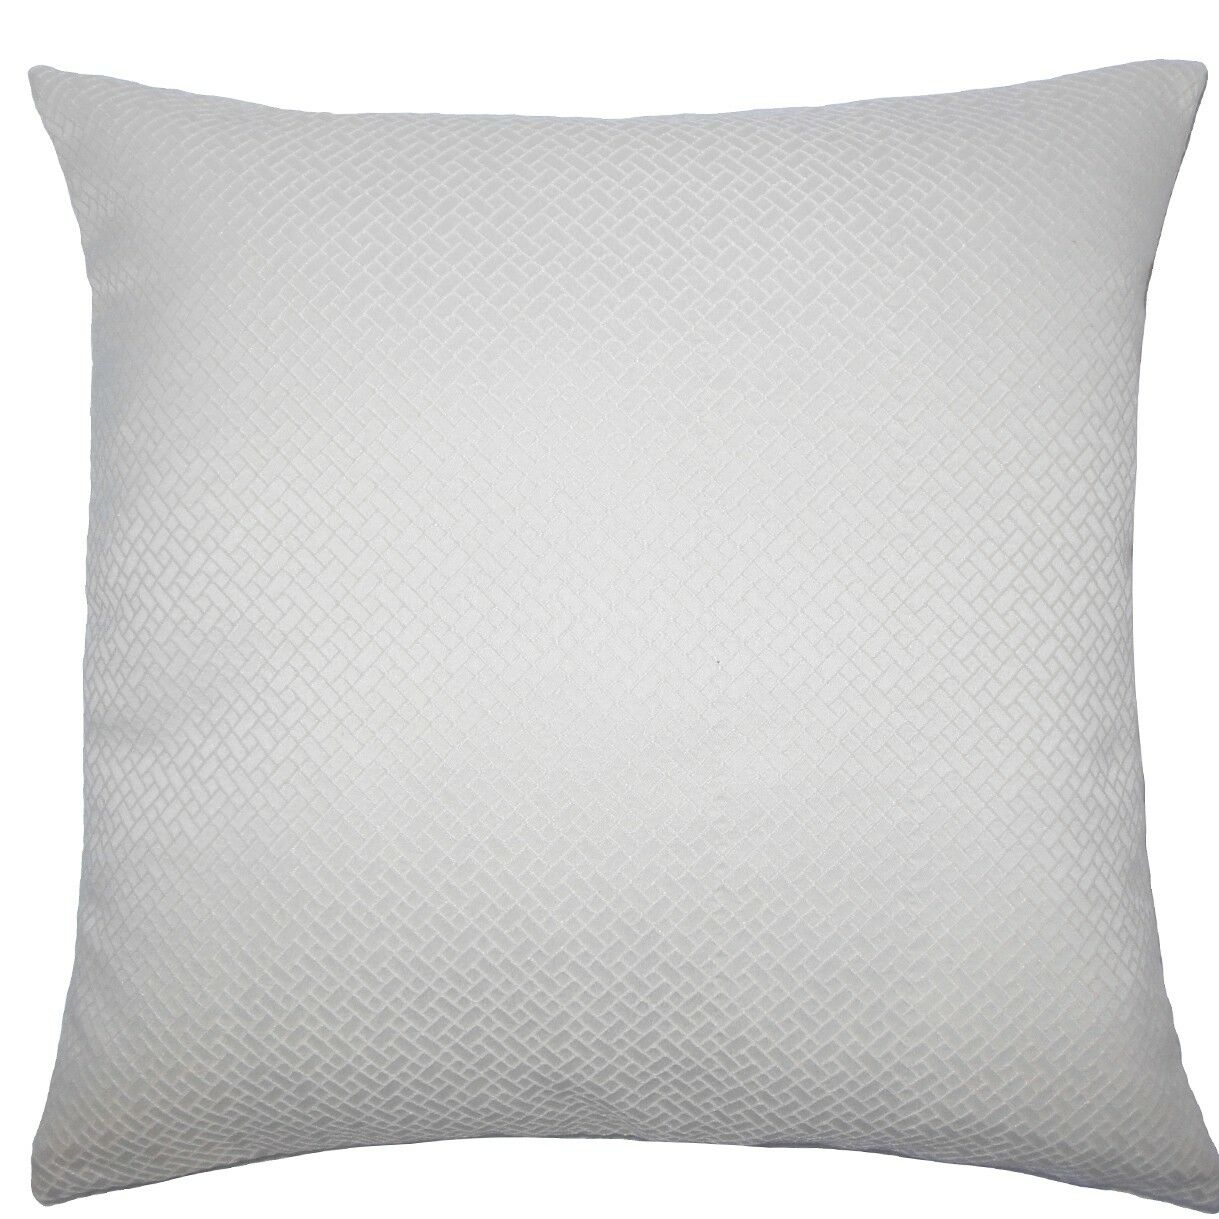 Pertessa Geometric Throw Pillow Color: Bone, Size: 24